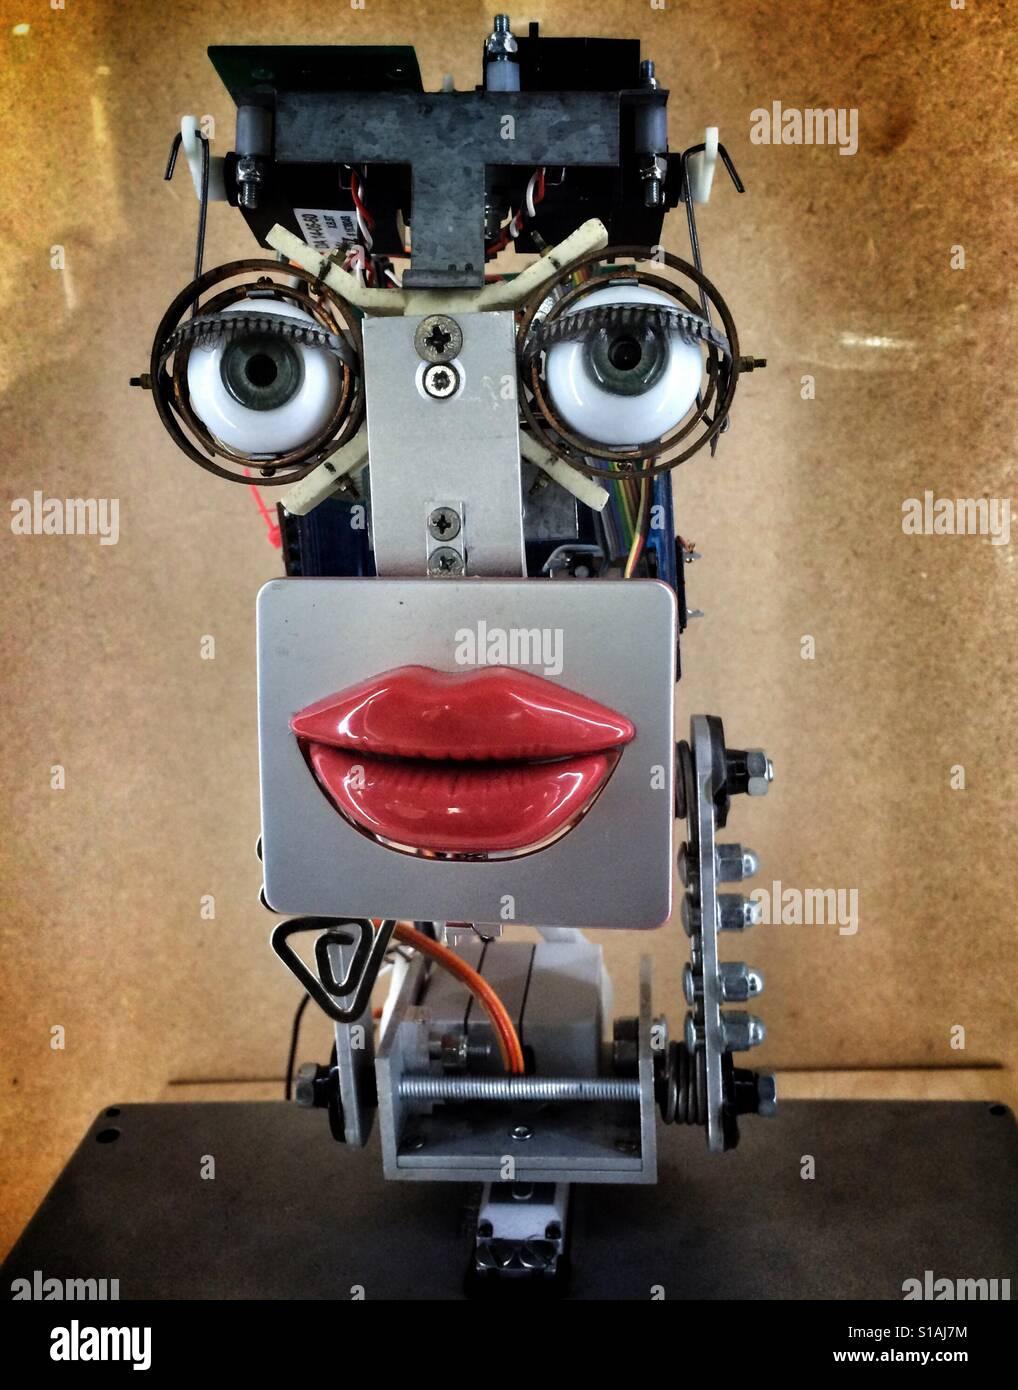 Funny robot head - Stock Image